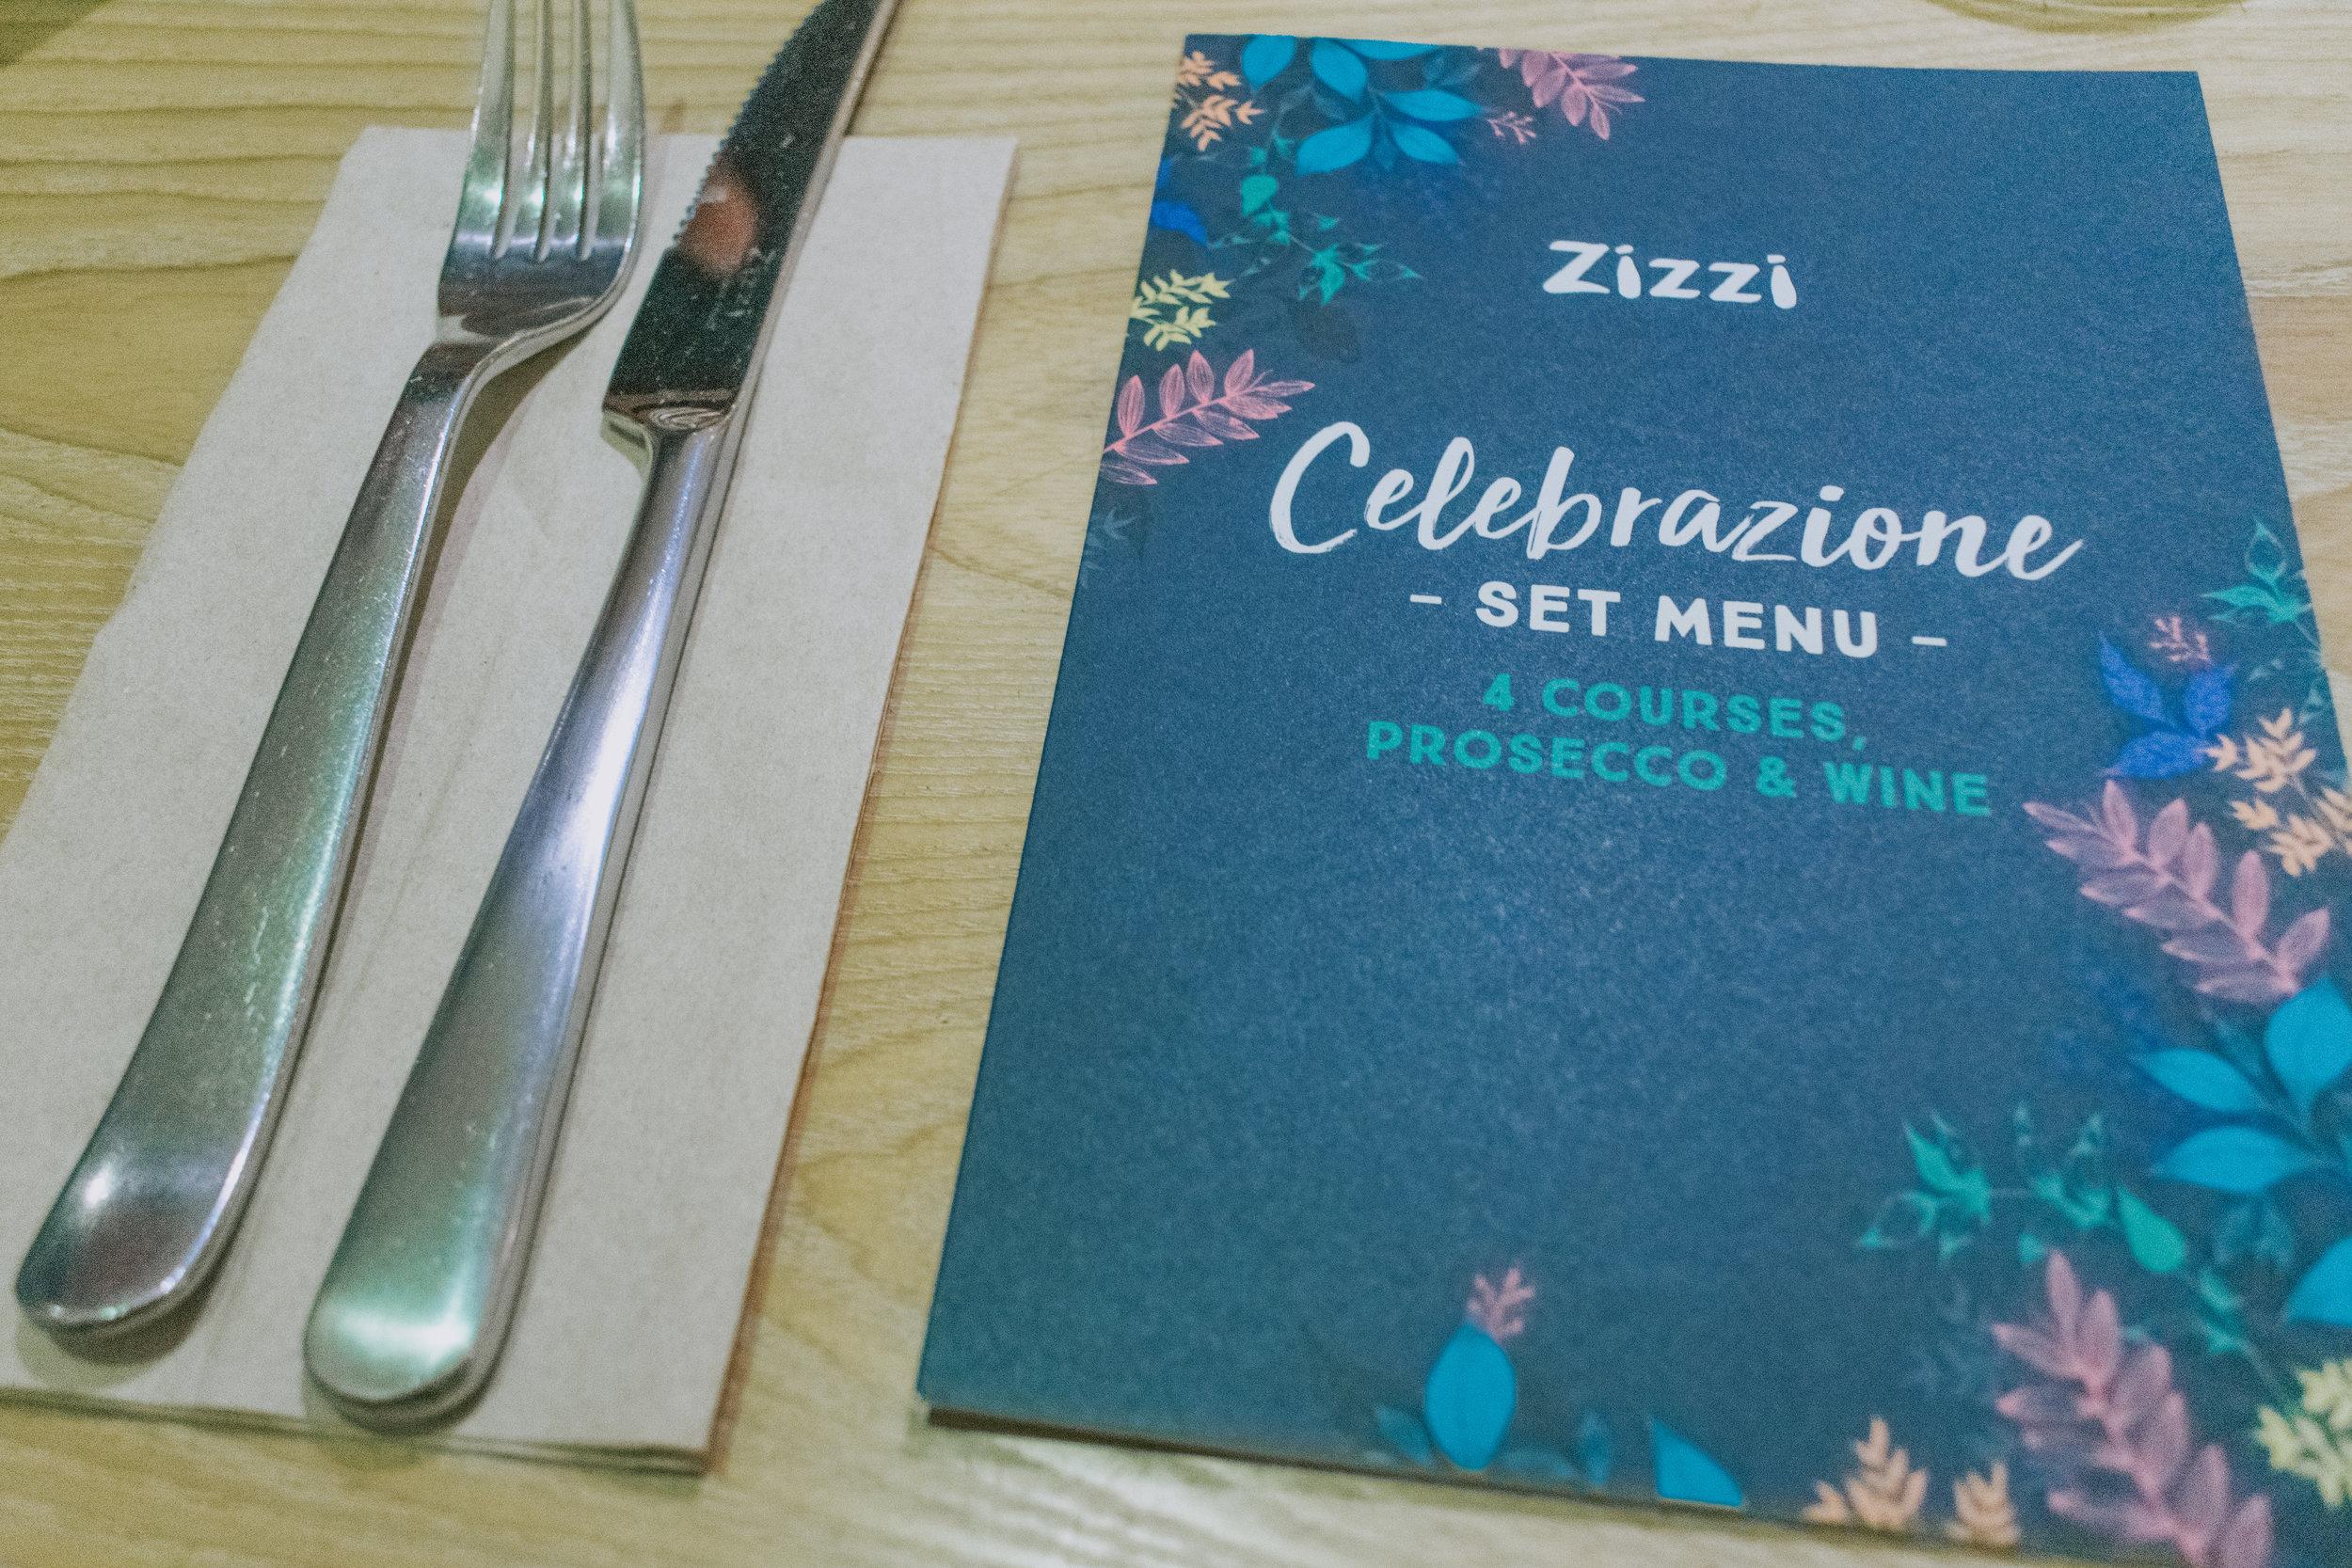 Zizzi Celebrazione set menu 4 courses, prosecco & wine